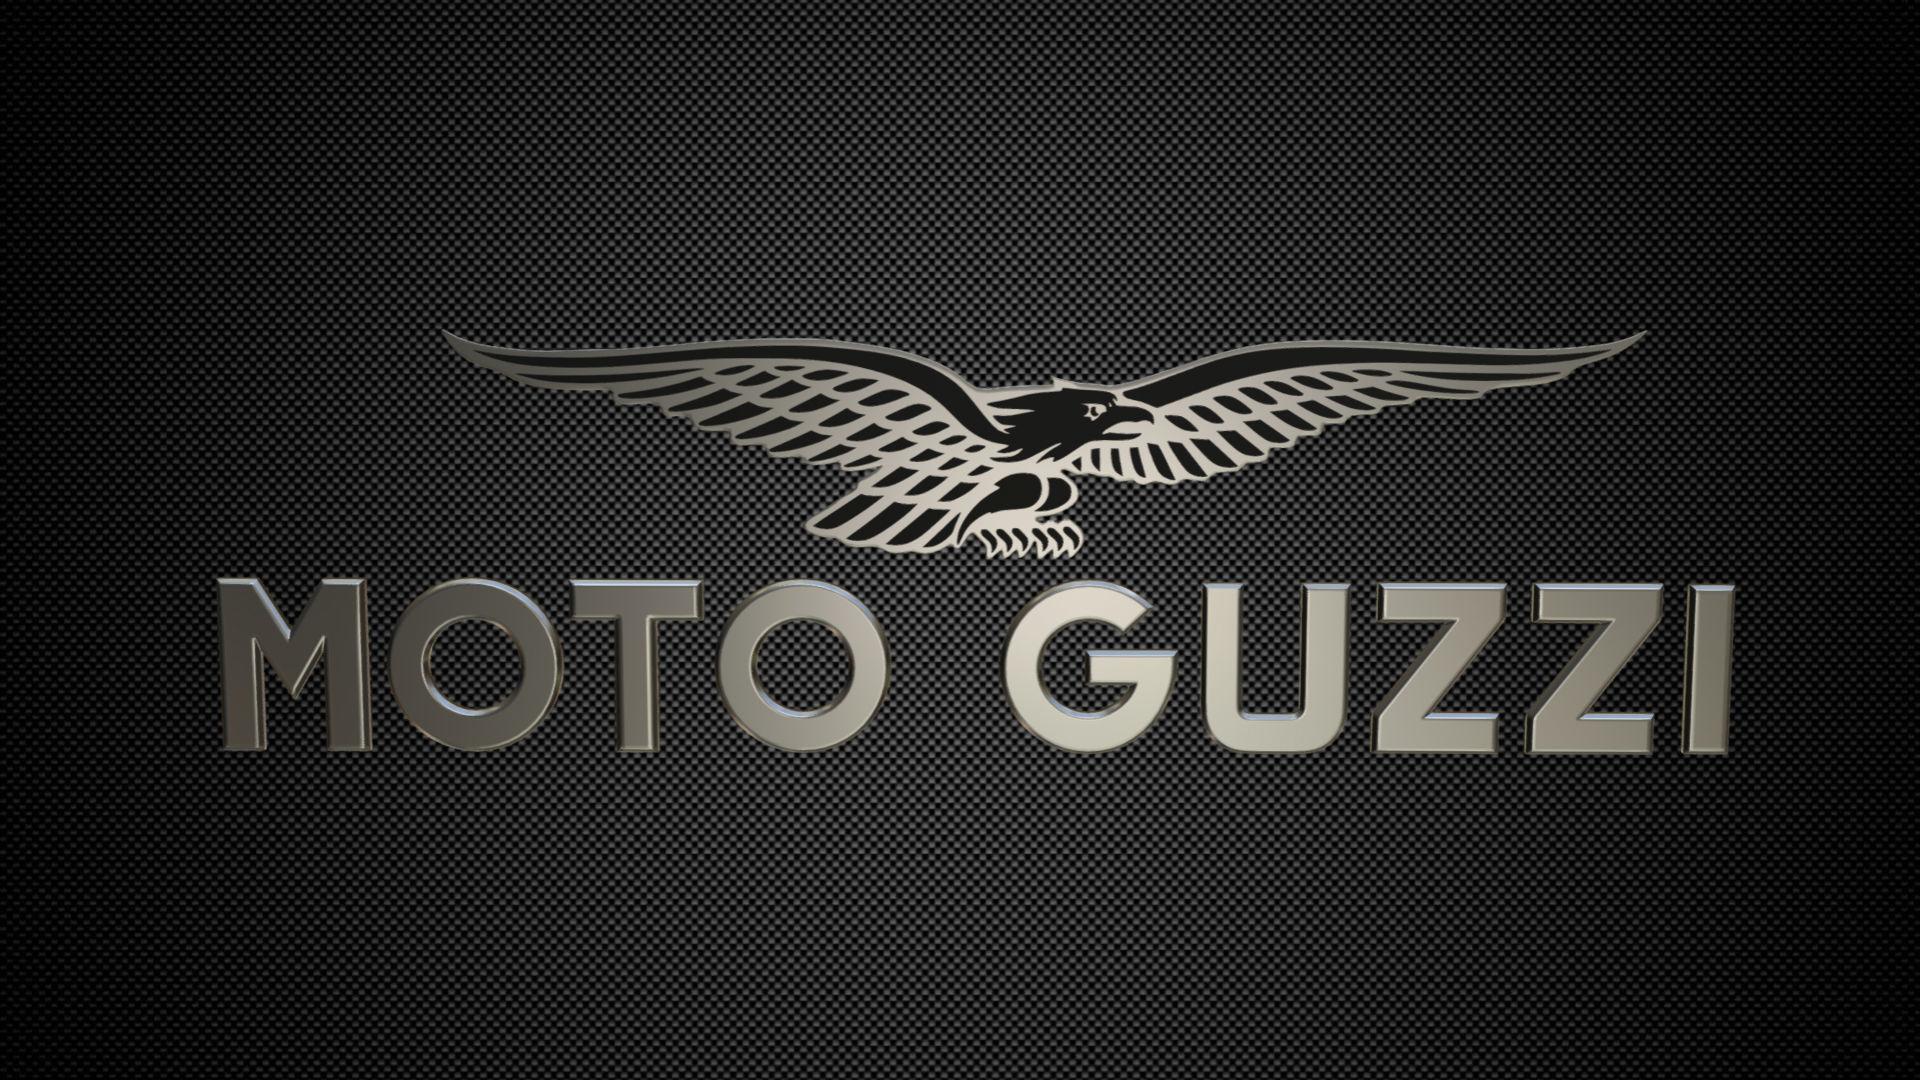 moto guzzi logo 3d